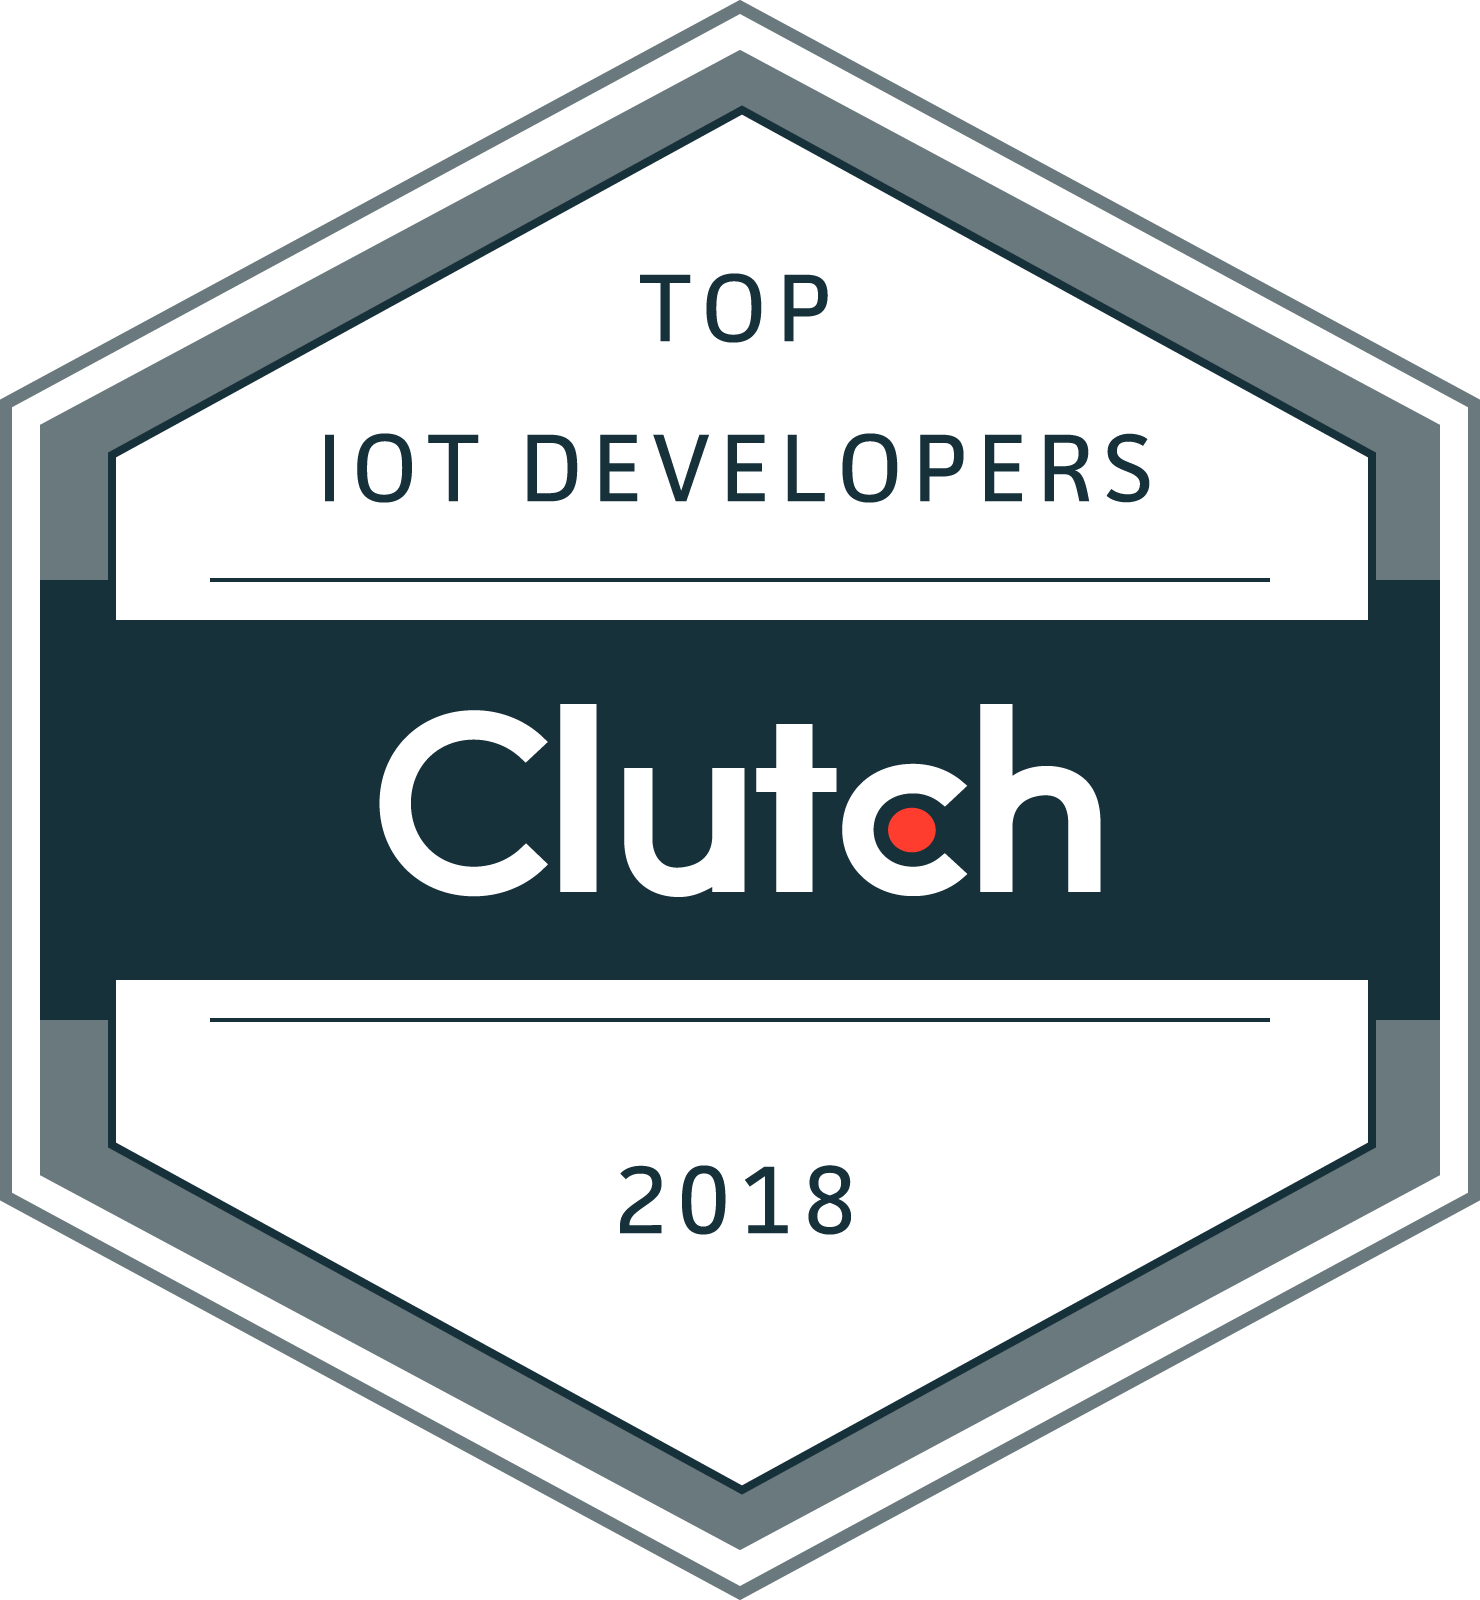 IoT Developers Clutch 2018